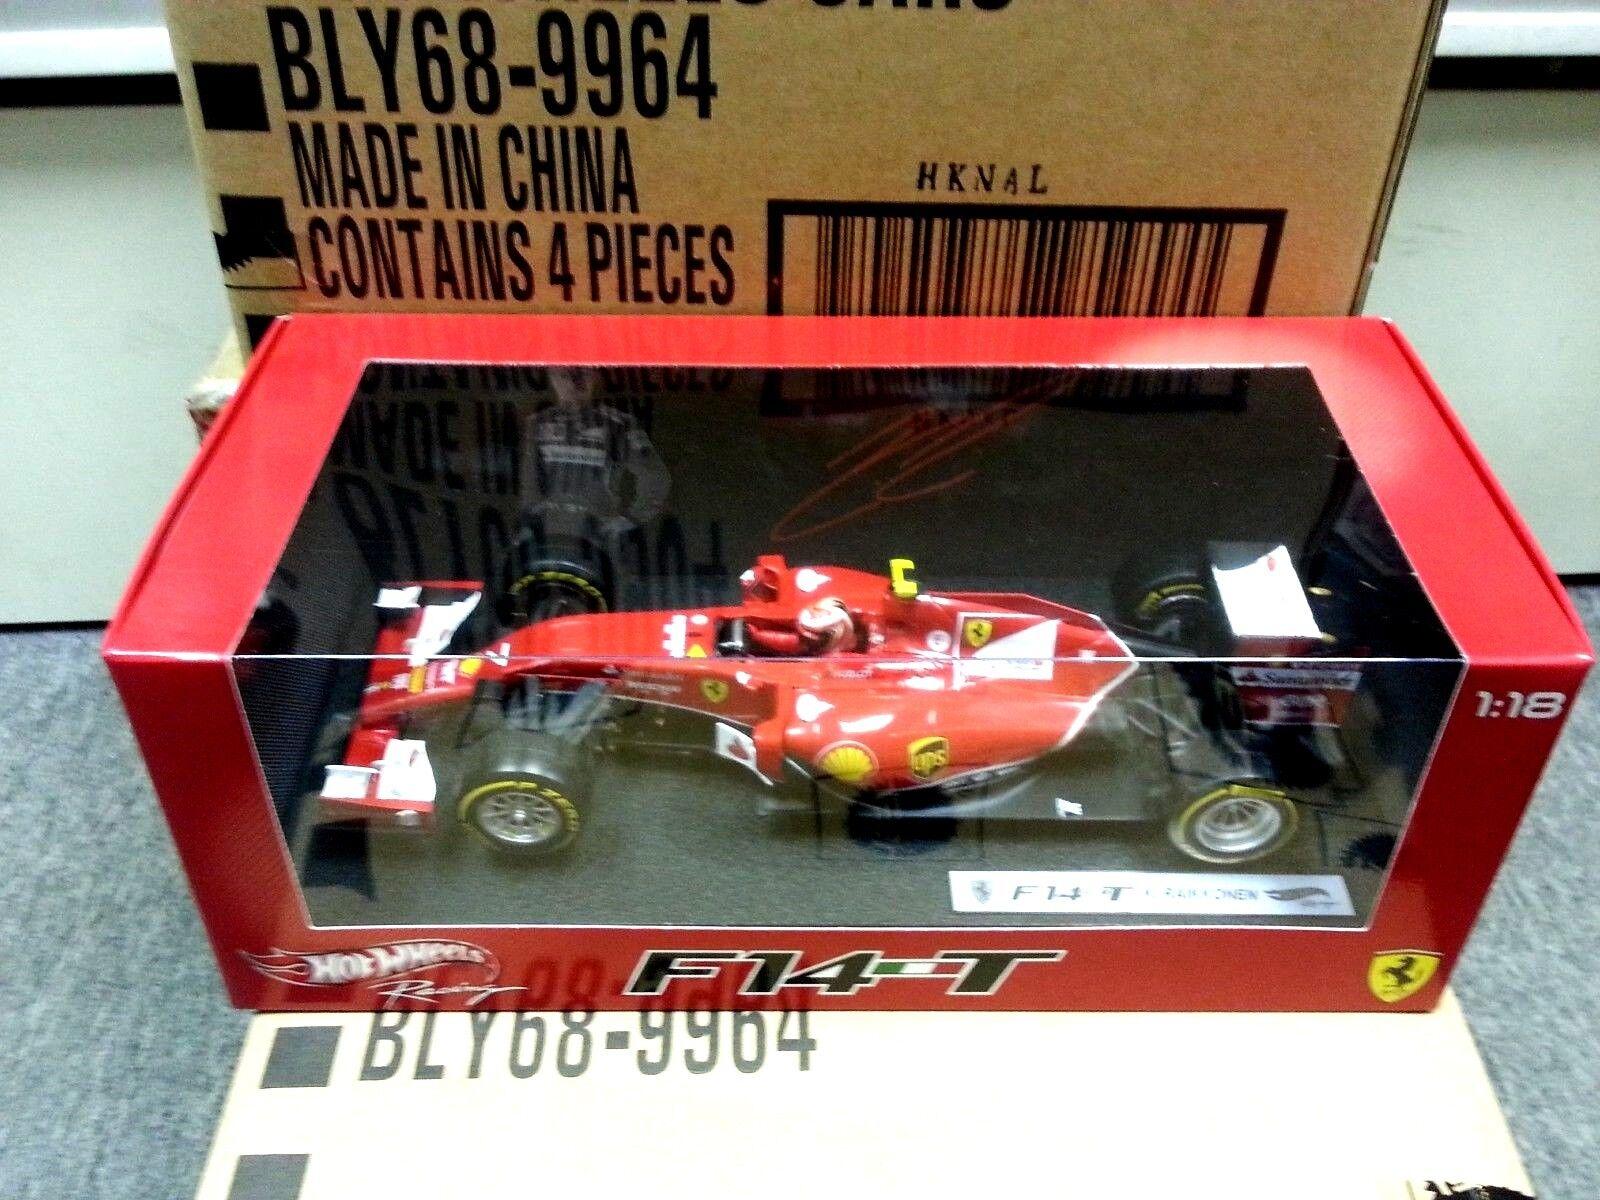 FERRARI F14T F1 GP 2014 Kimi Raikkonen HOTWtalons  1 18  BLY68  grosses soldes